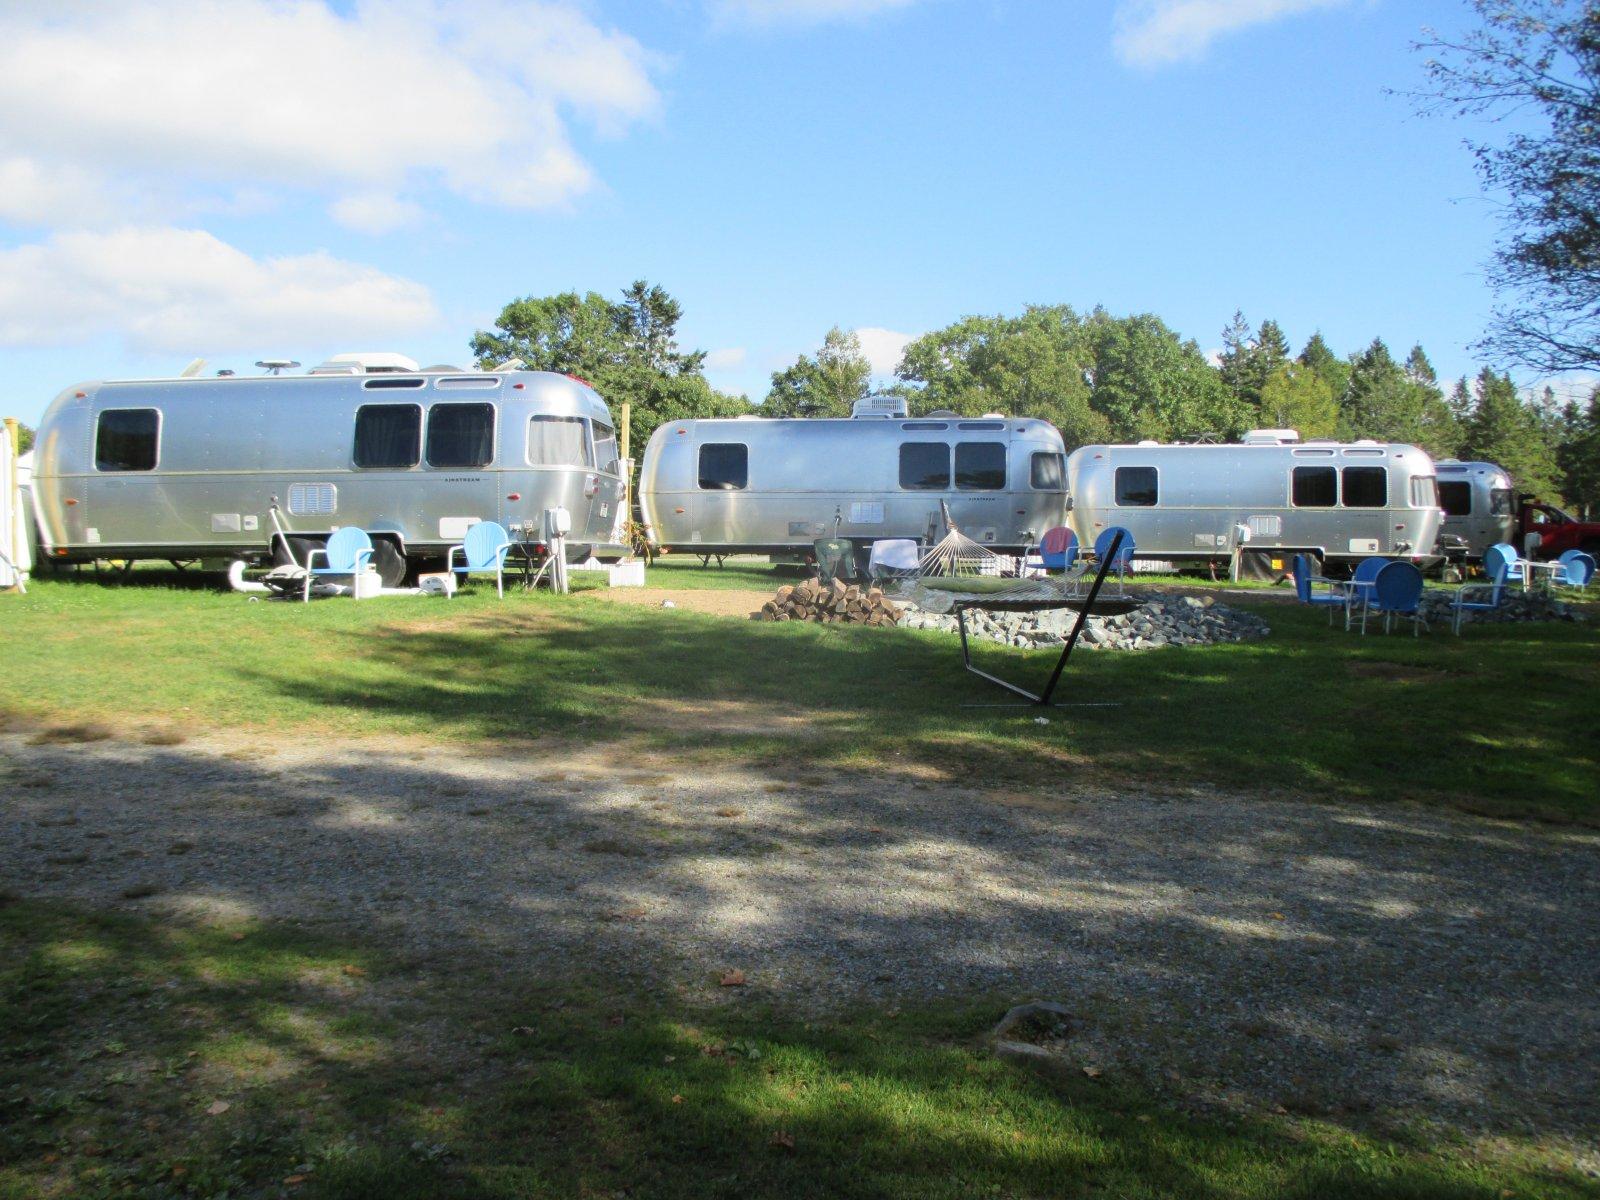 Click image for larger version  Name:1409 Aluminum Cabins at KOA.jpg Views:155 Size:339.9 KB ID:221603